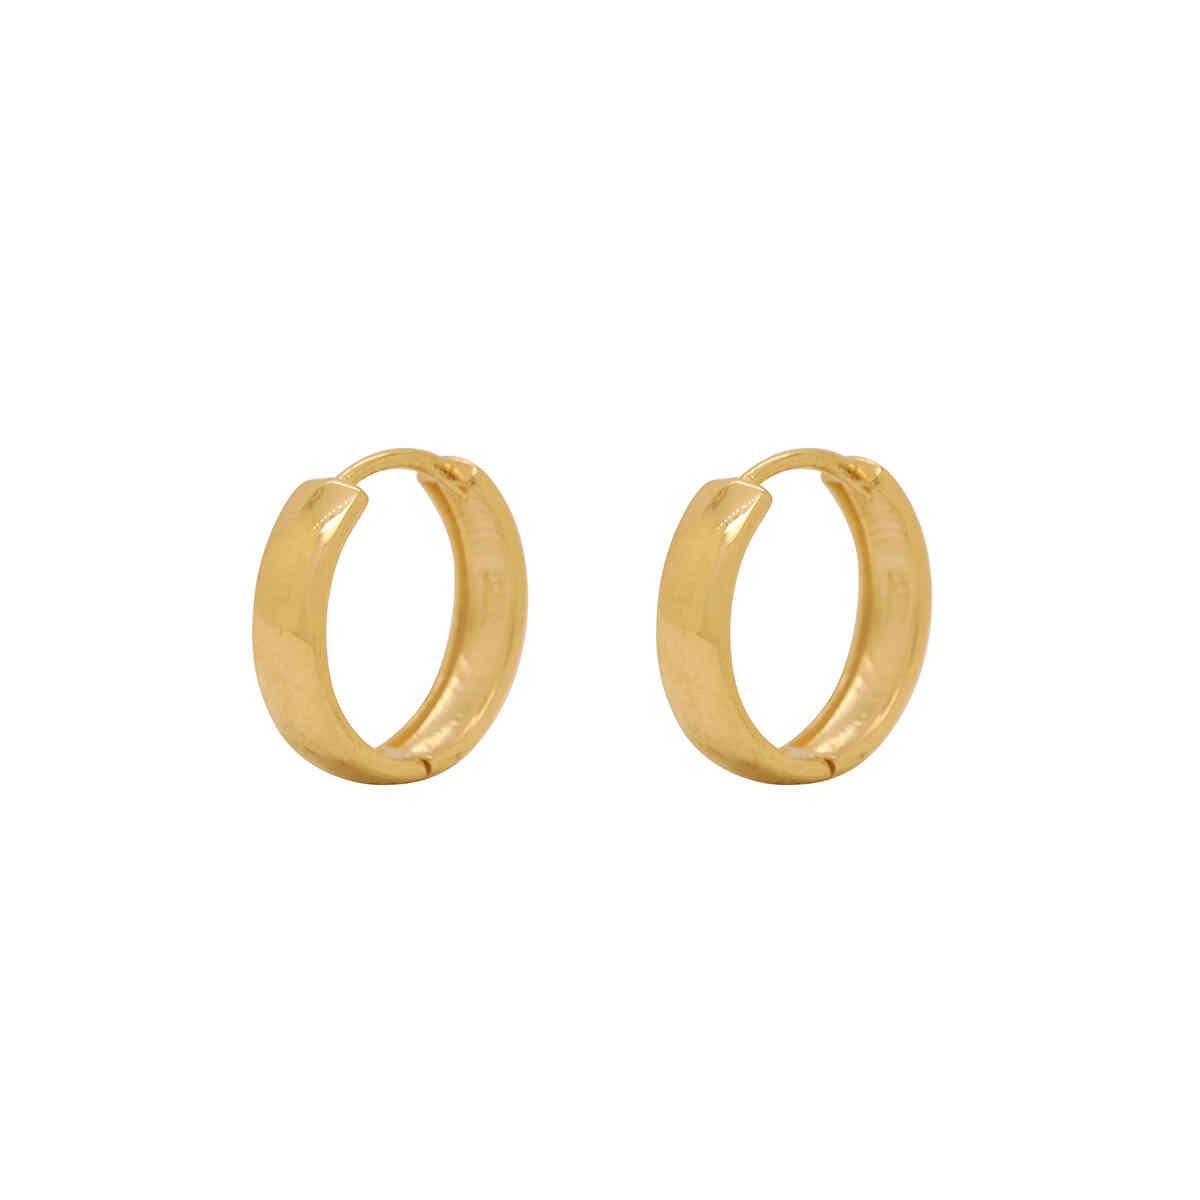 Brinco Ouro 18k Argola Tradicional 14 mm